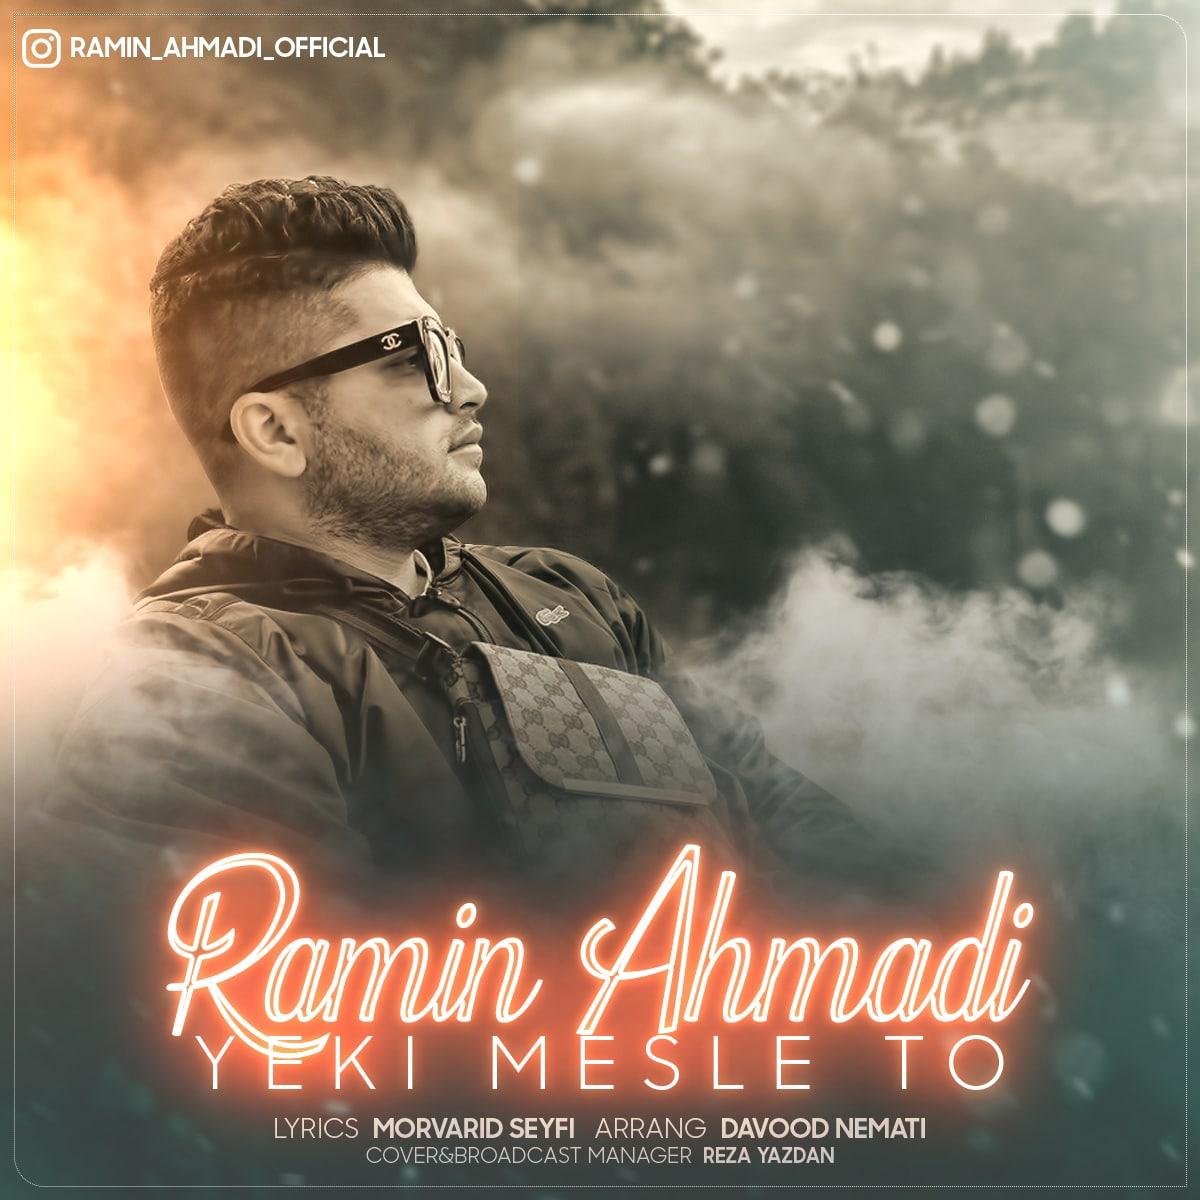 Ramin Ahmadi – Yeki Mesle To